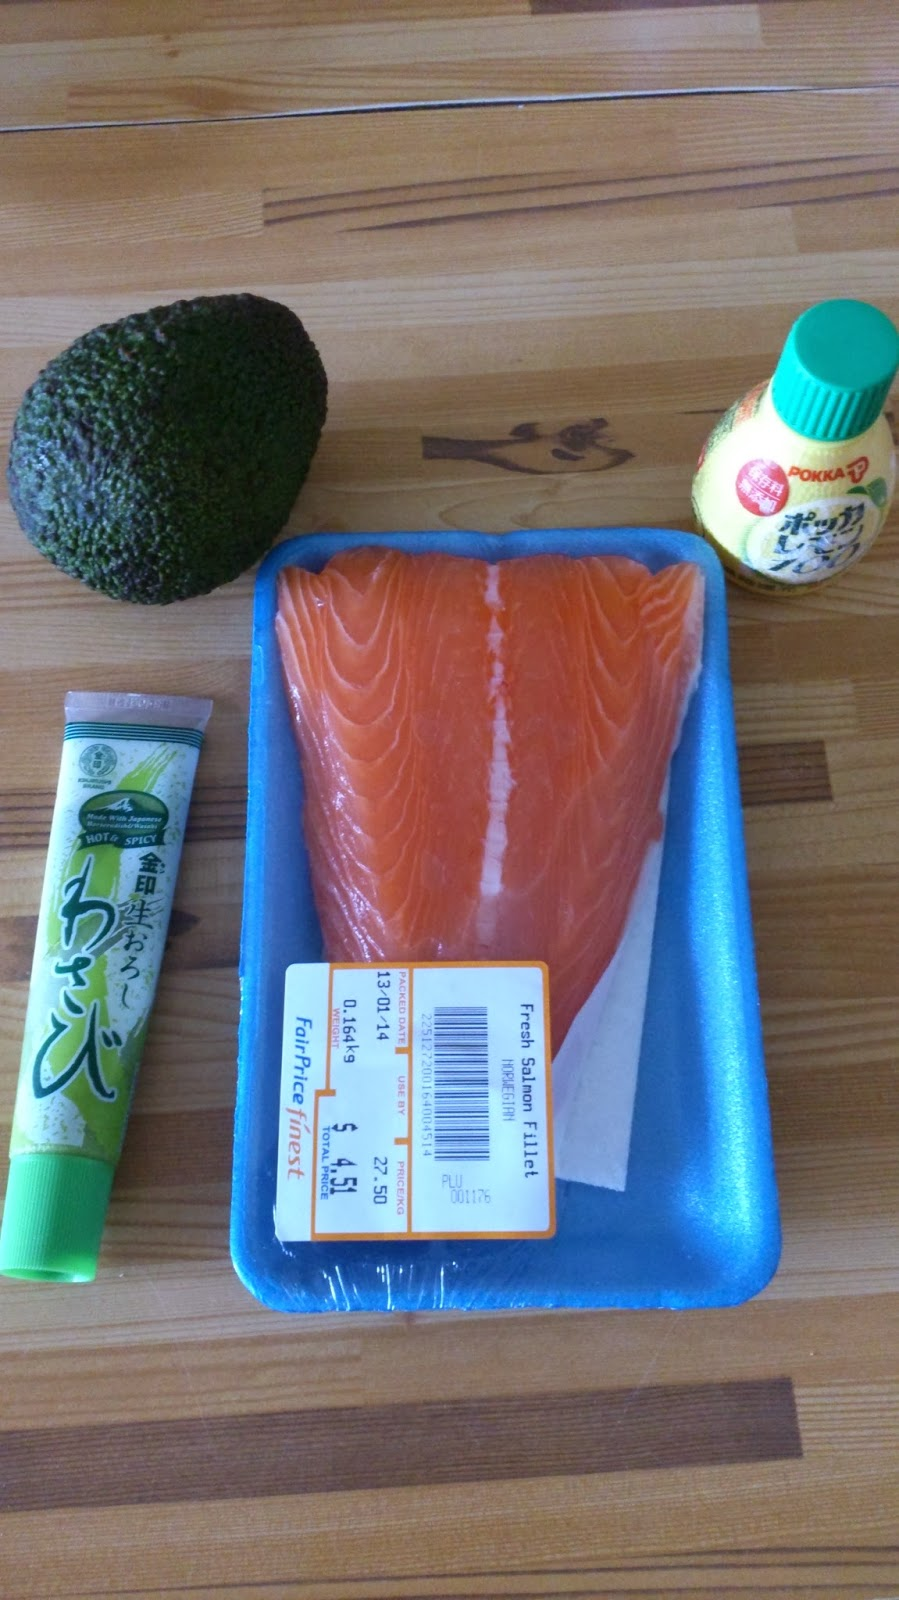 Avocado Salmon Wasabi Lemon